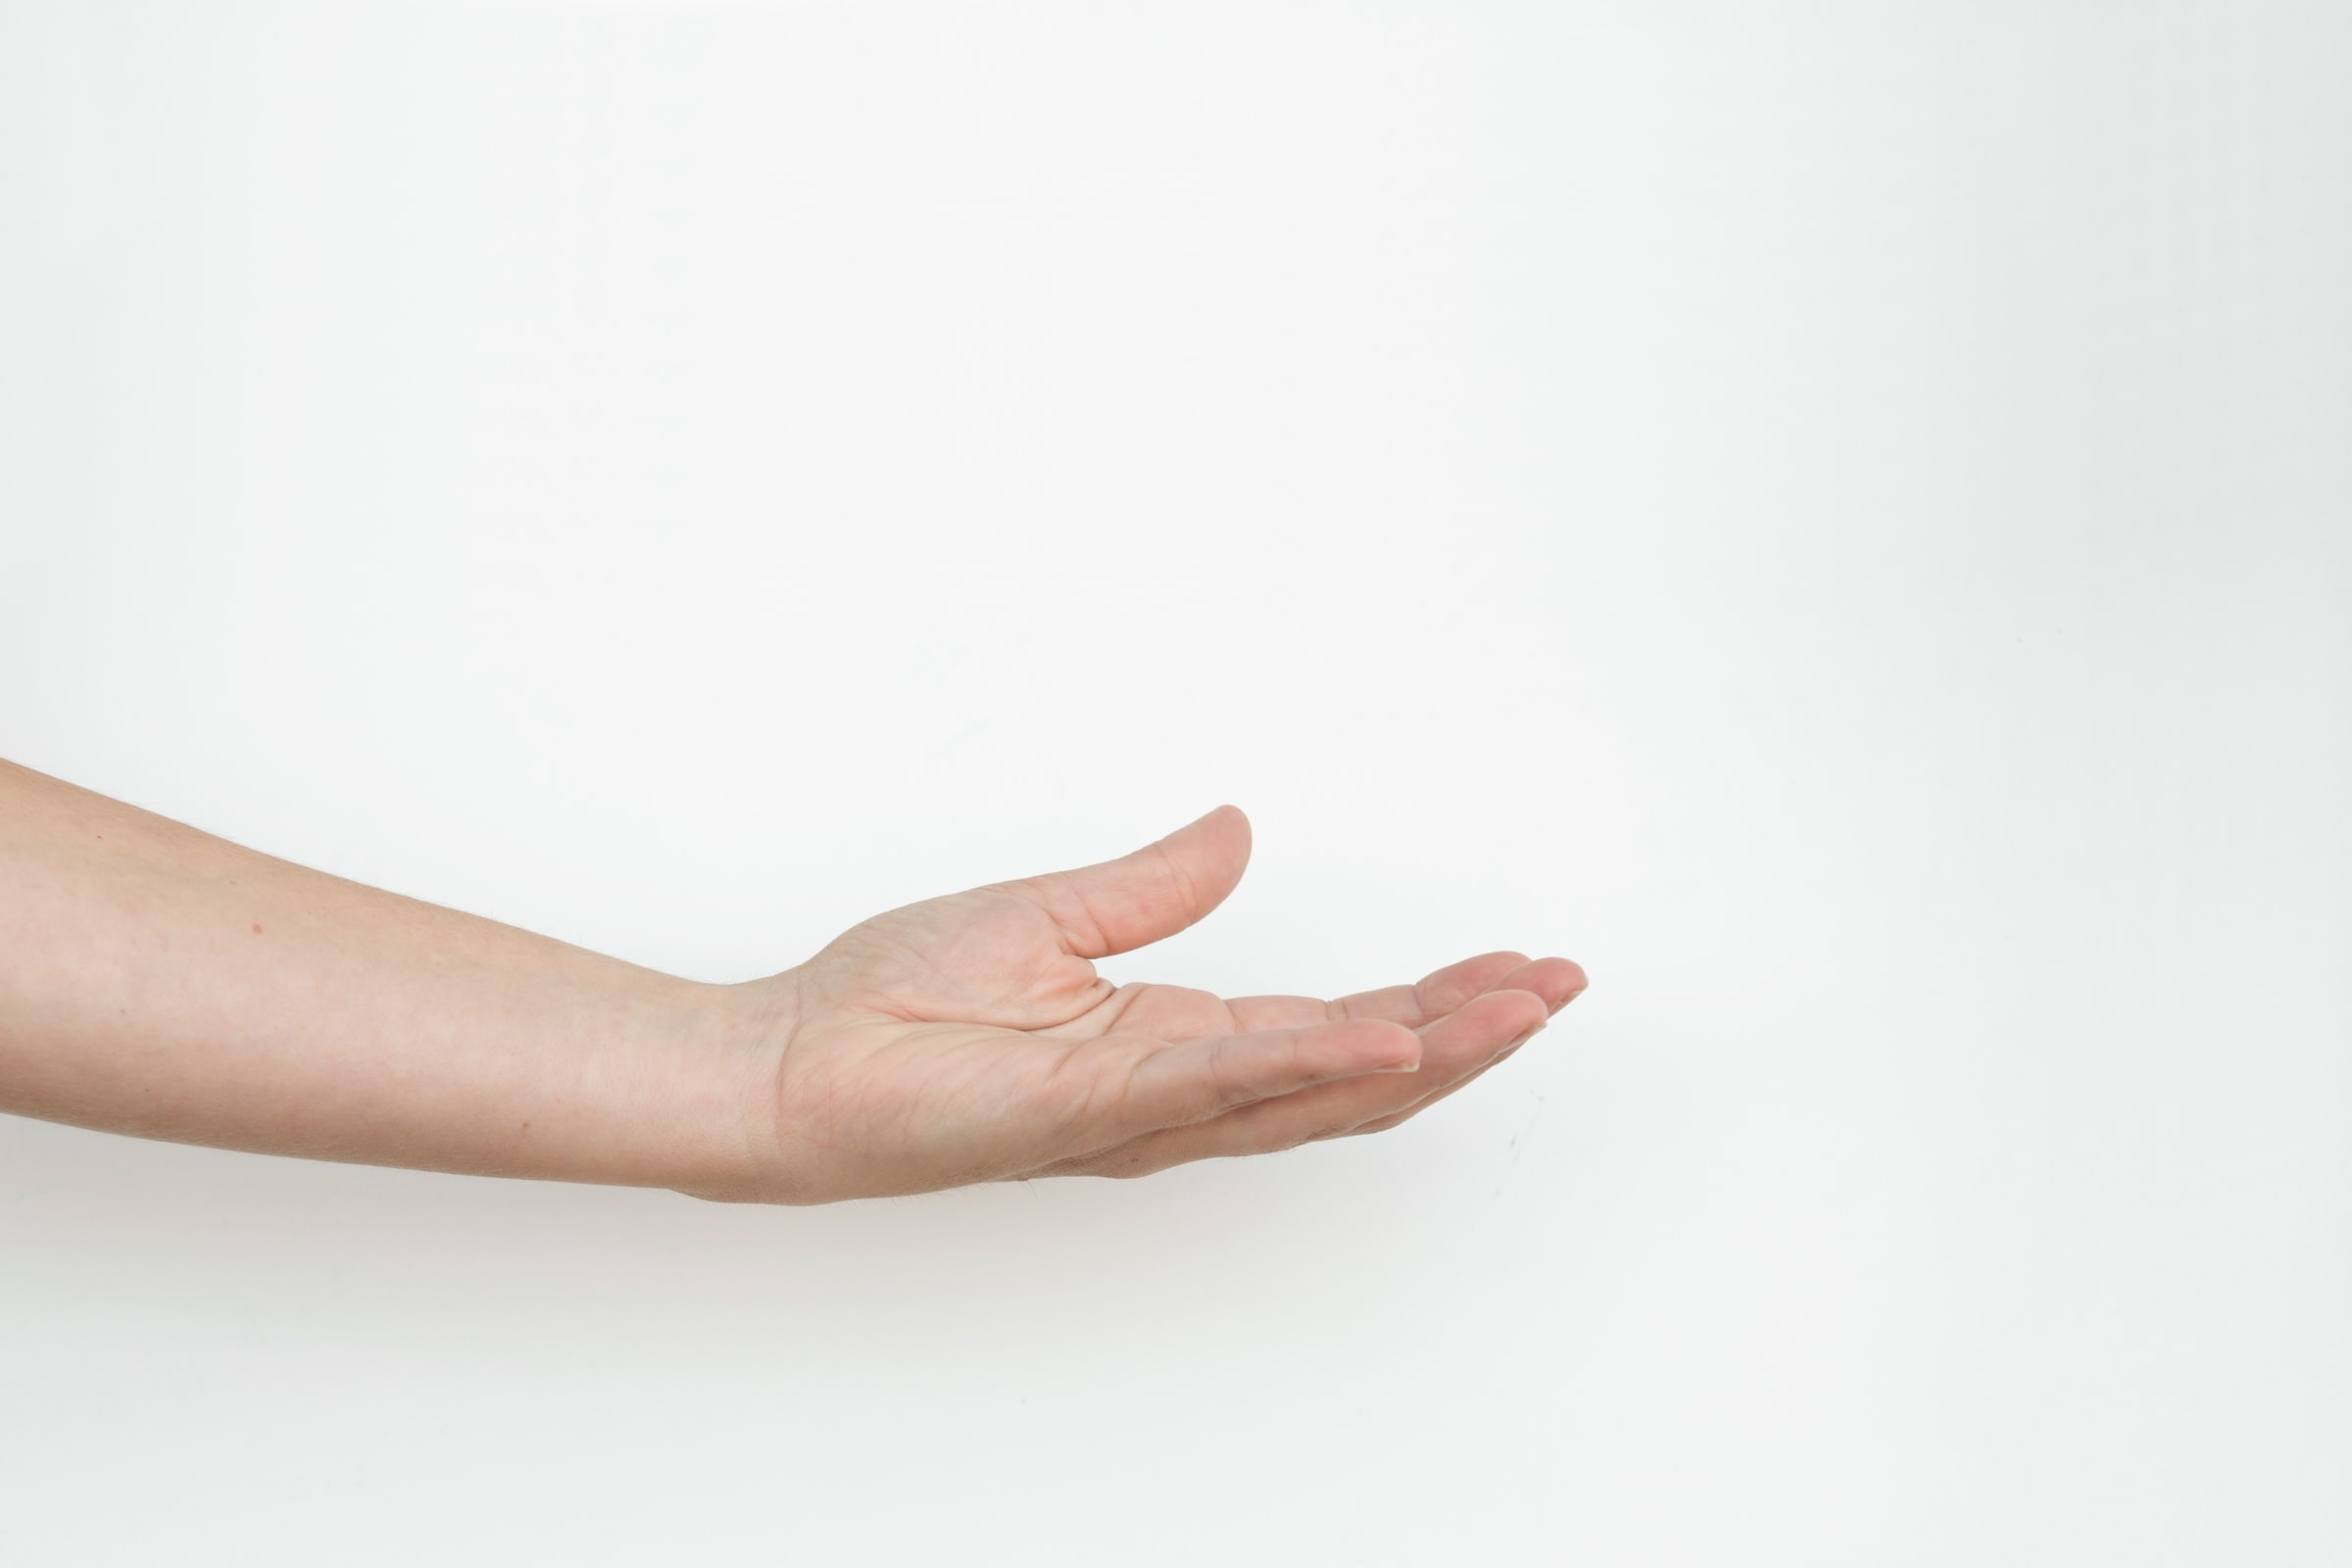 gesture-control